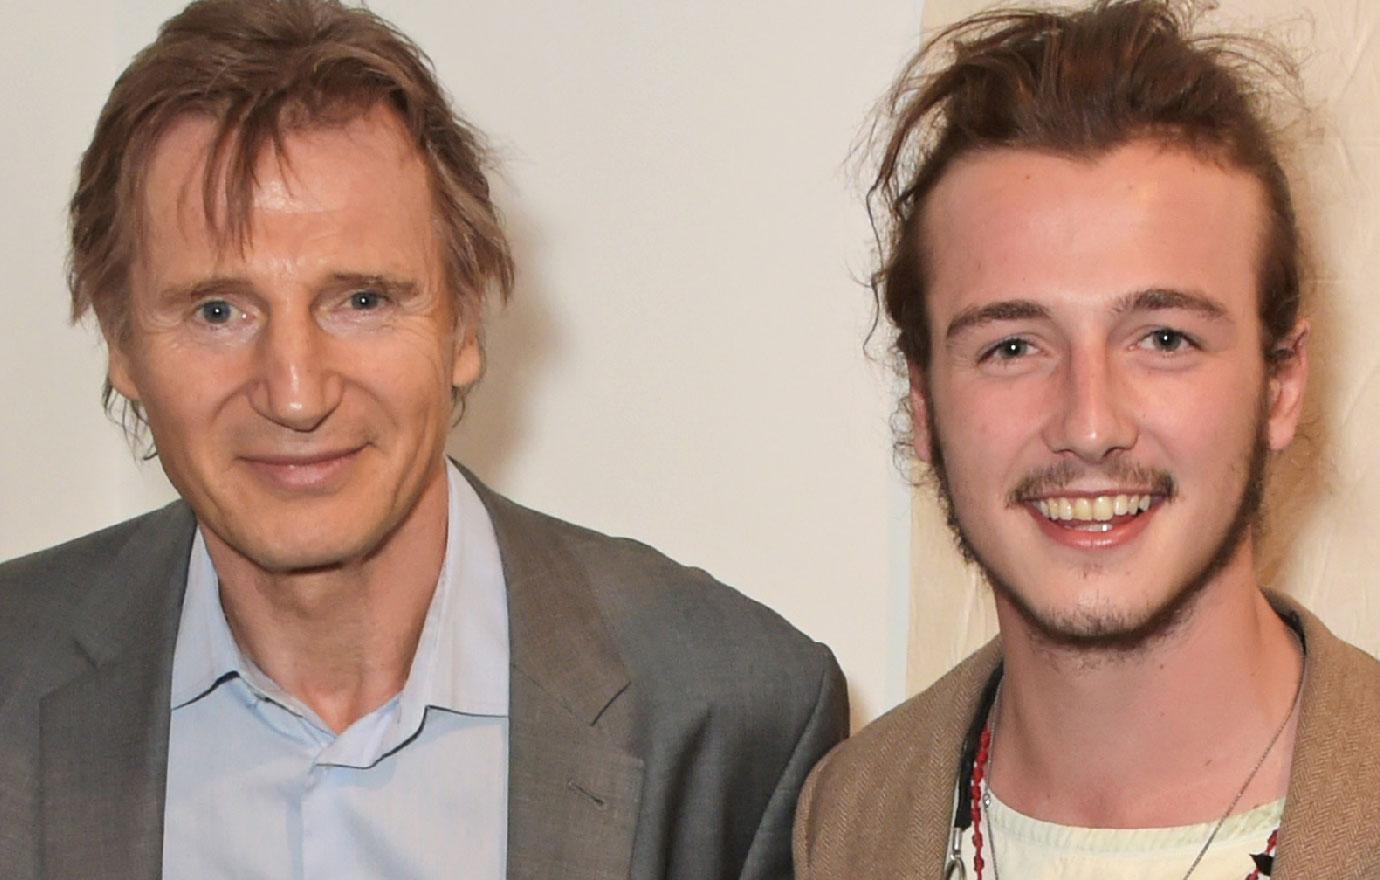 Liam Neeson Son Adopts Dead Mom Natasha Richardson's Last Name